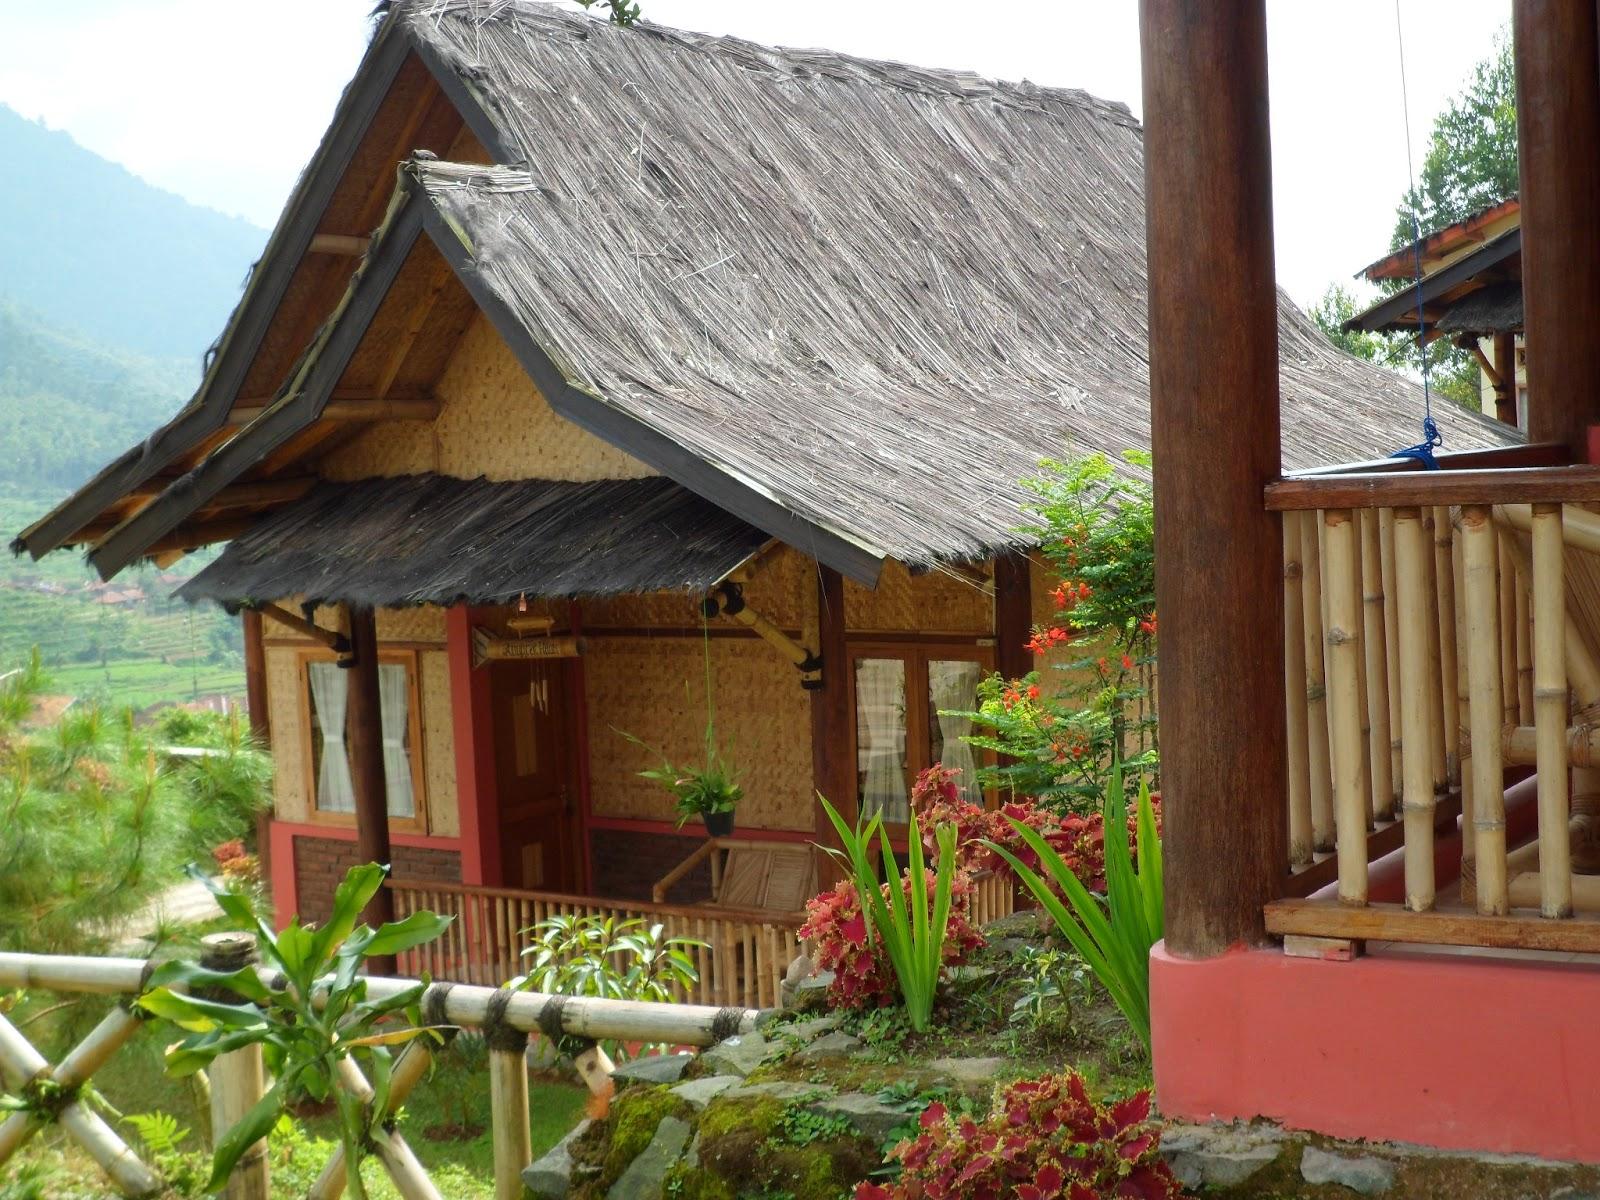 Saung Gawir Ciwidey Bandung